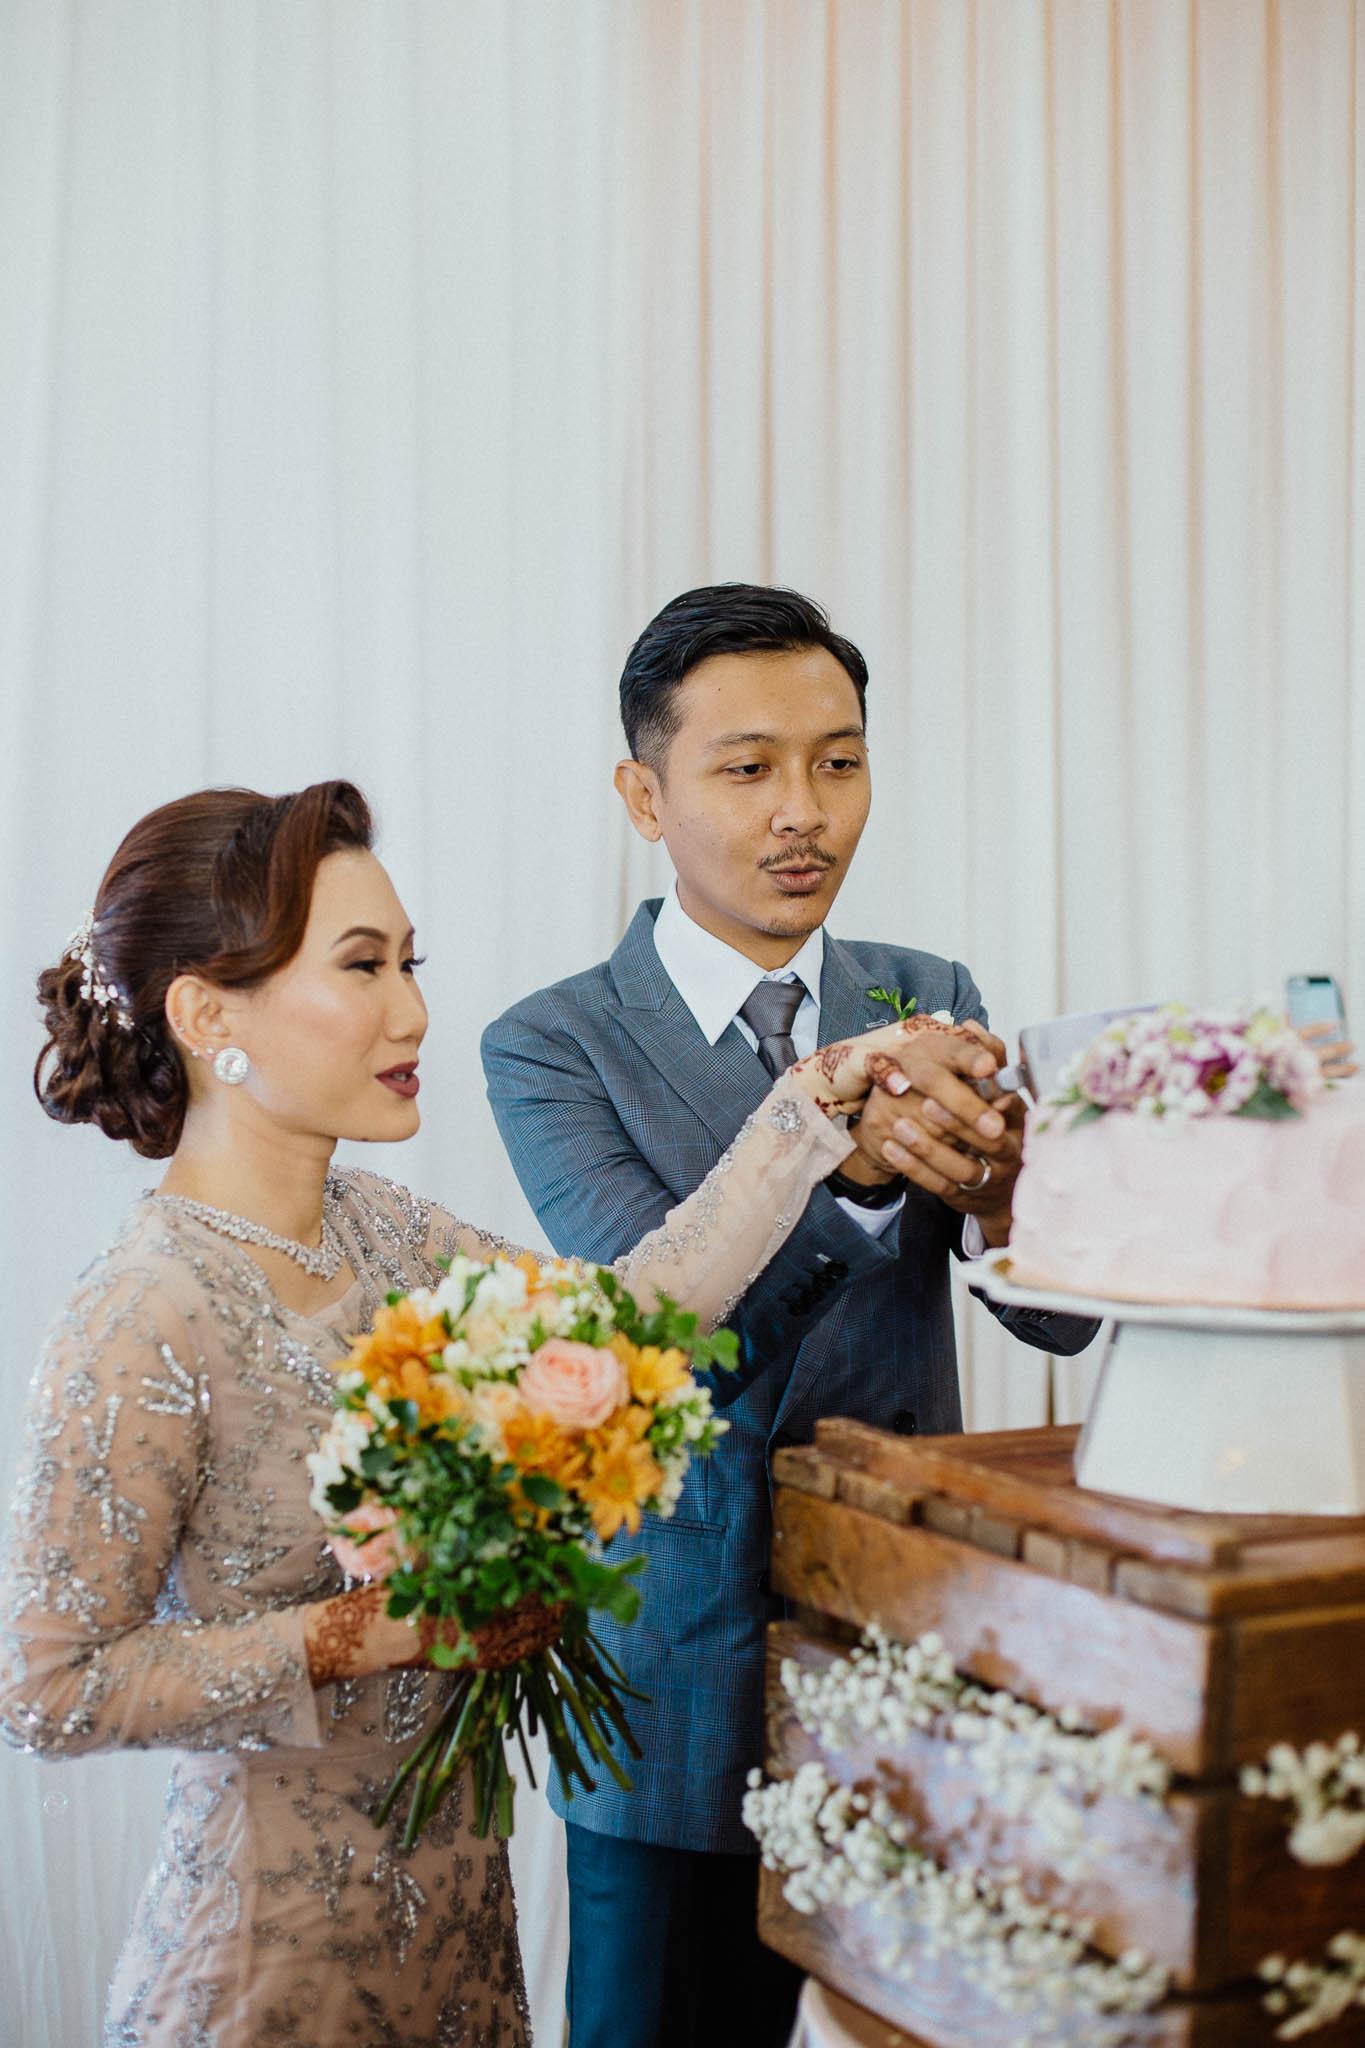 singapore-wedding-photographer-addafiq-nufail-052.jpg